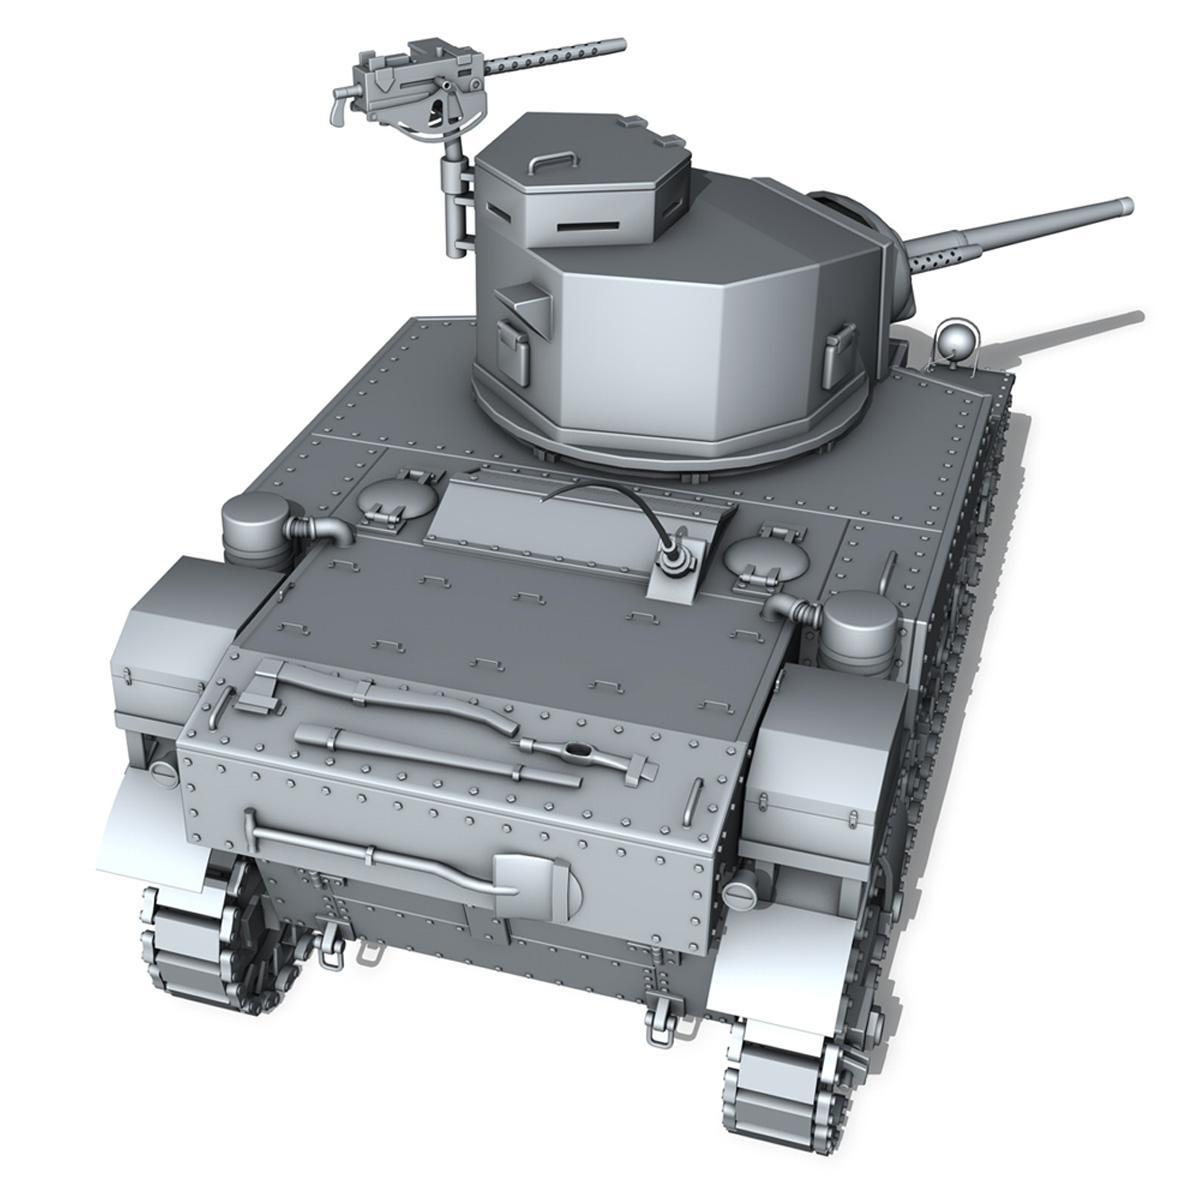 m3 light tank stuart – early production 3d model 3ds fbx c4d lwo obj 189173